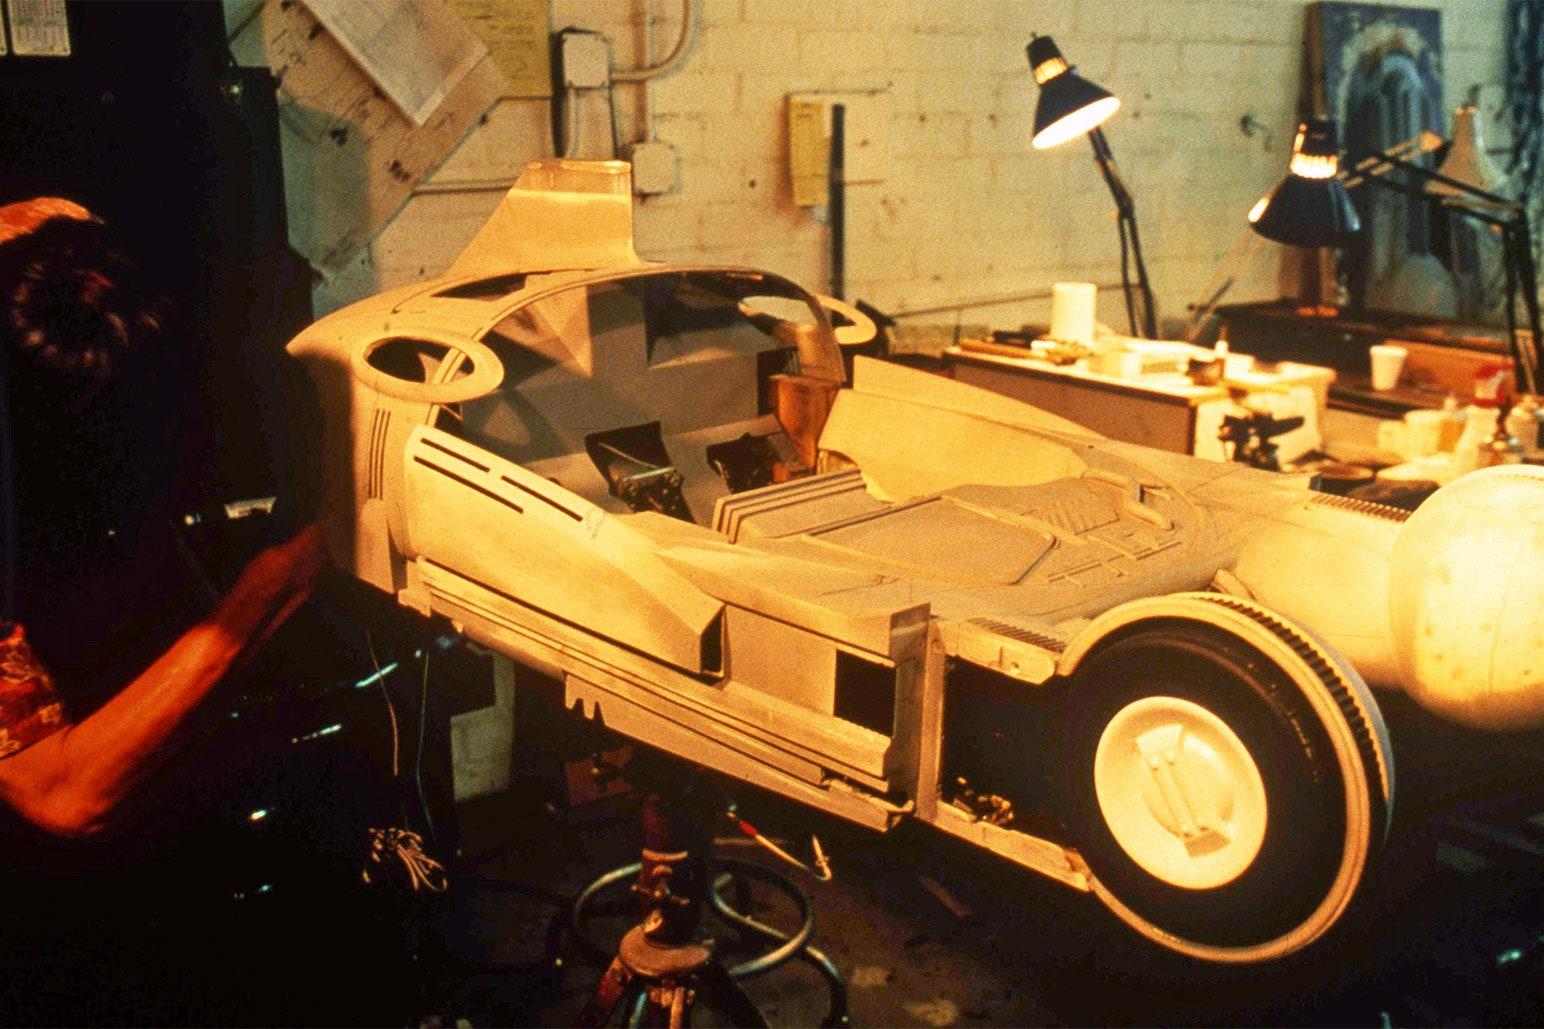 The Making of Blade Runner - thescriptblog.com